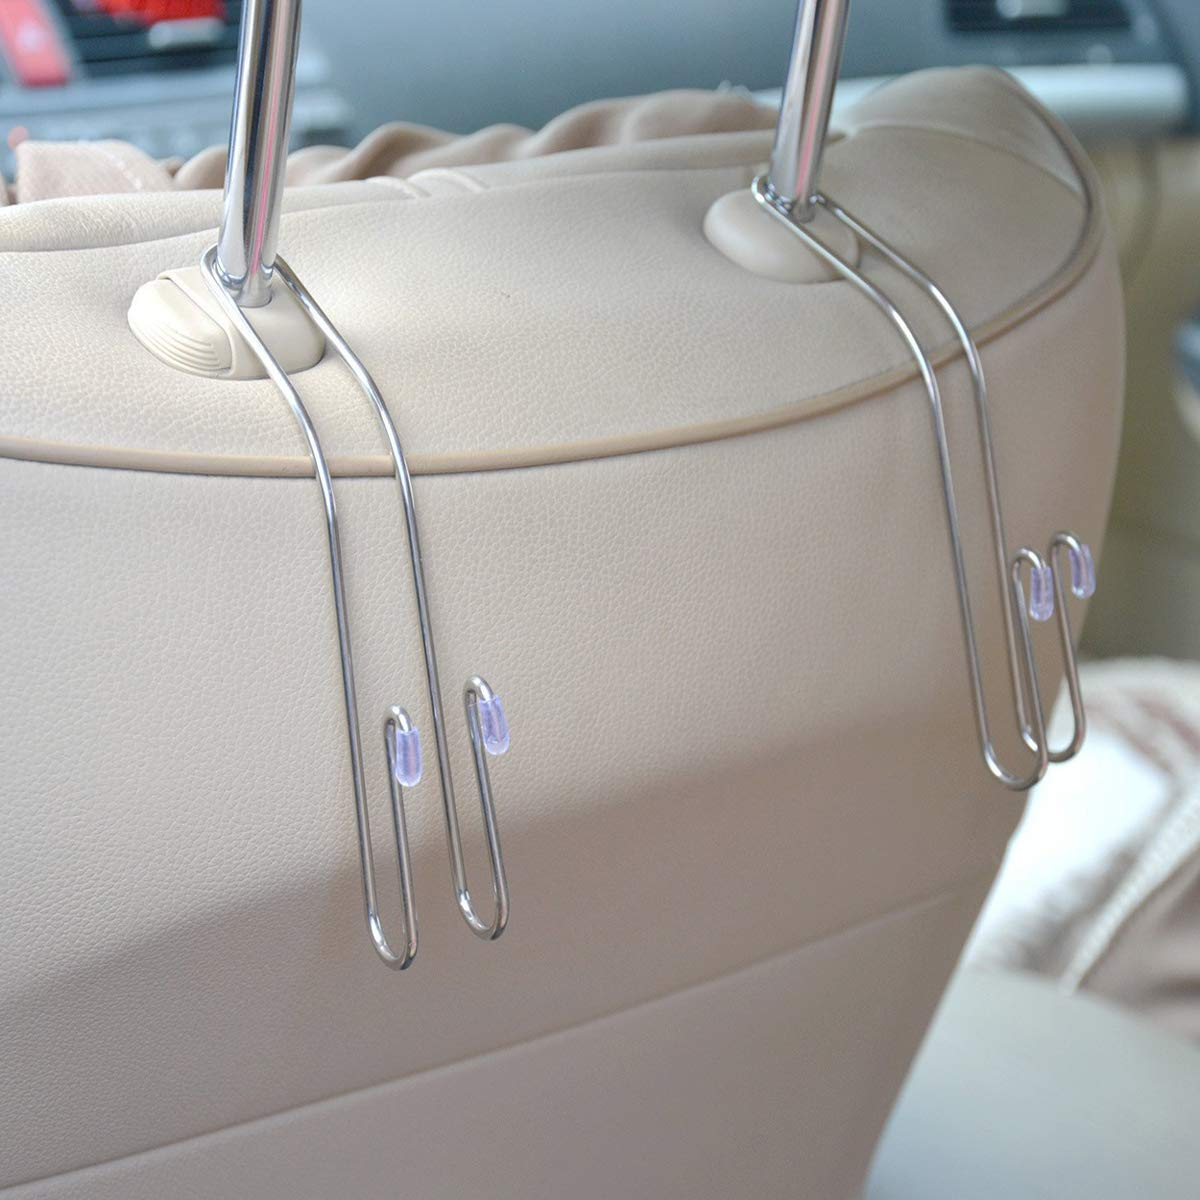 EldHus 4-Pack Car Hooks, Truck Vehicle Back Seat Headrest Hanger Holder Hook for Bag Purse Cloth Coat Grocery (Metallic)